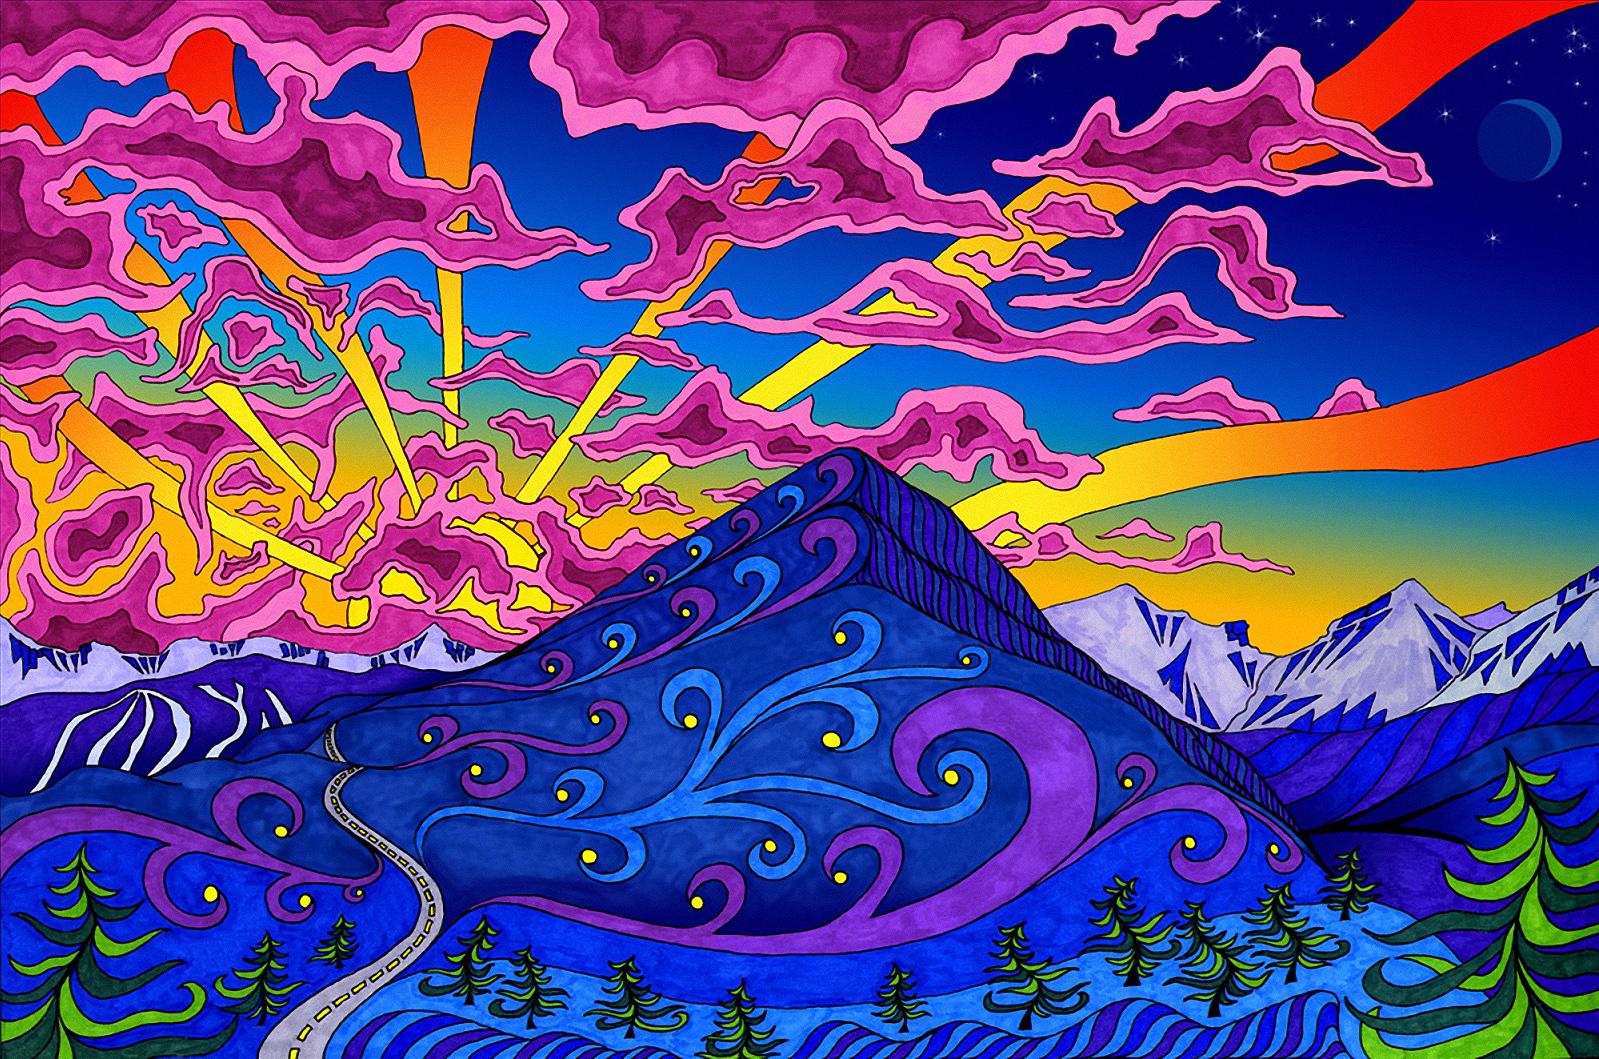 Psychedelic Computer Wallpapers Desktop Backgrounds 1599x1059